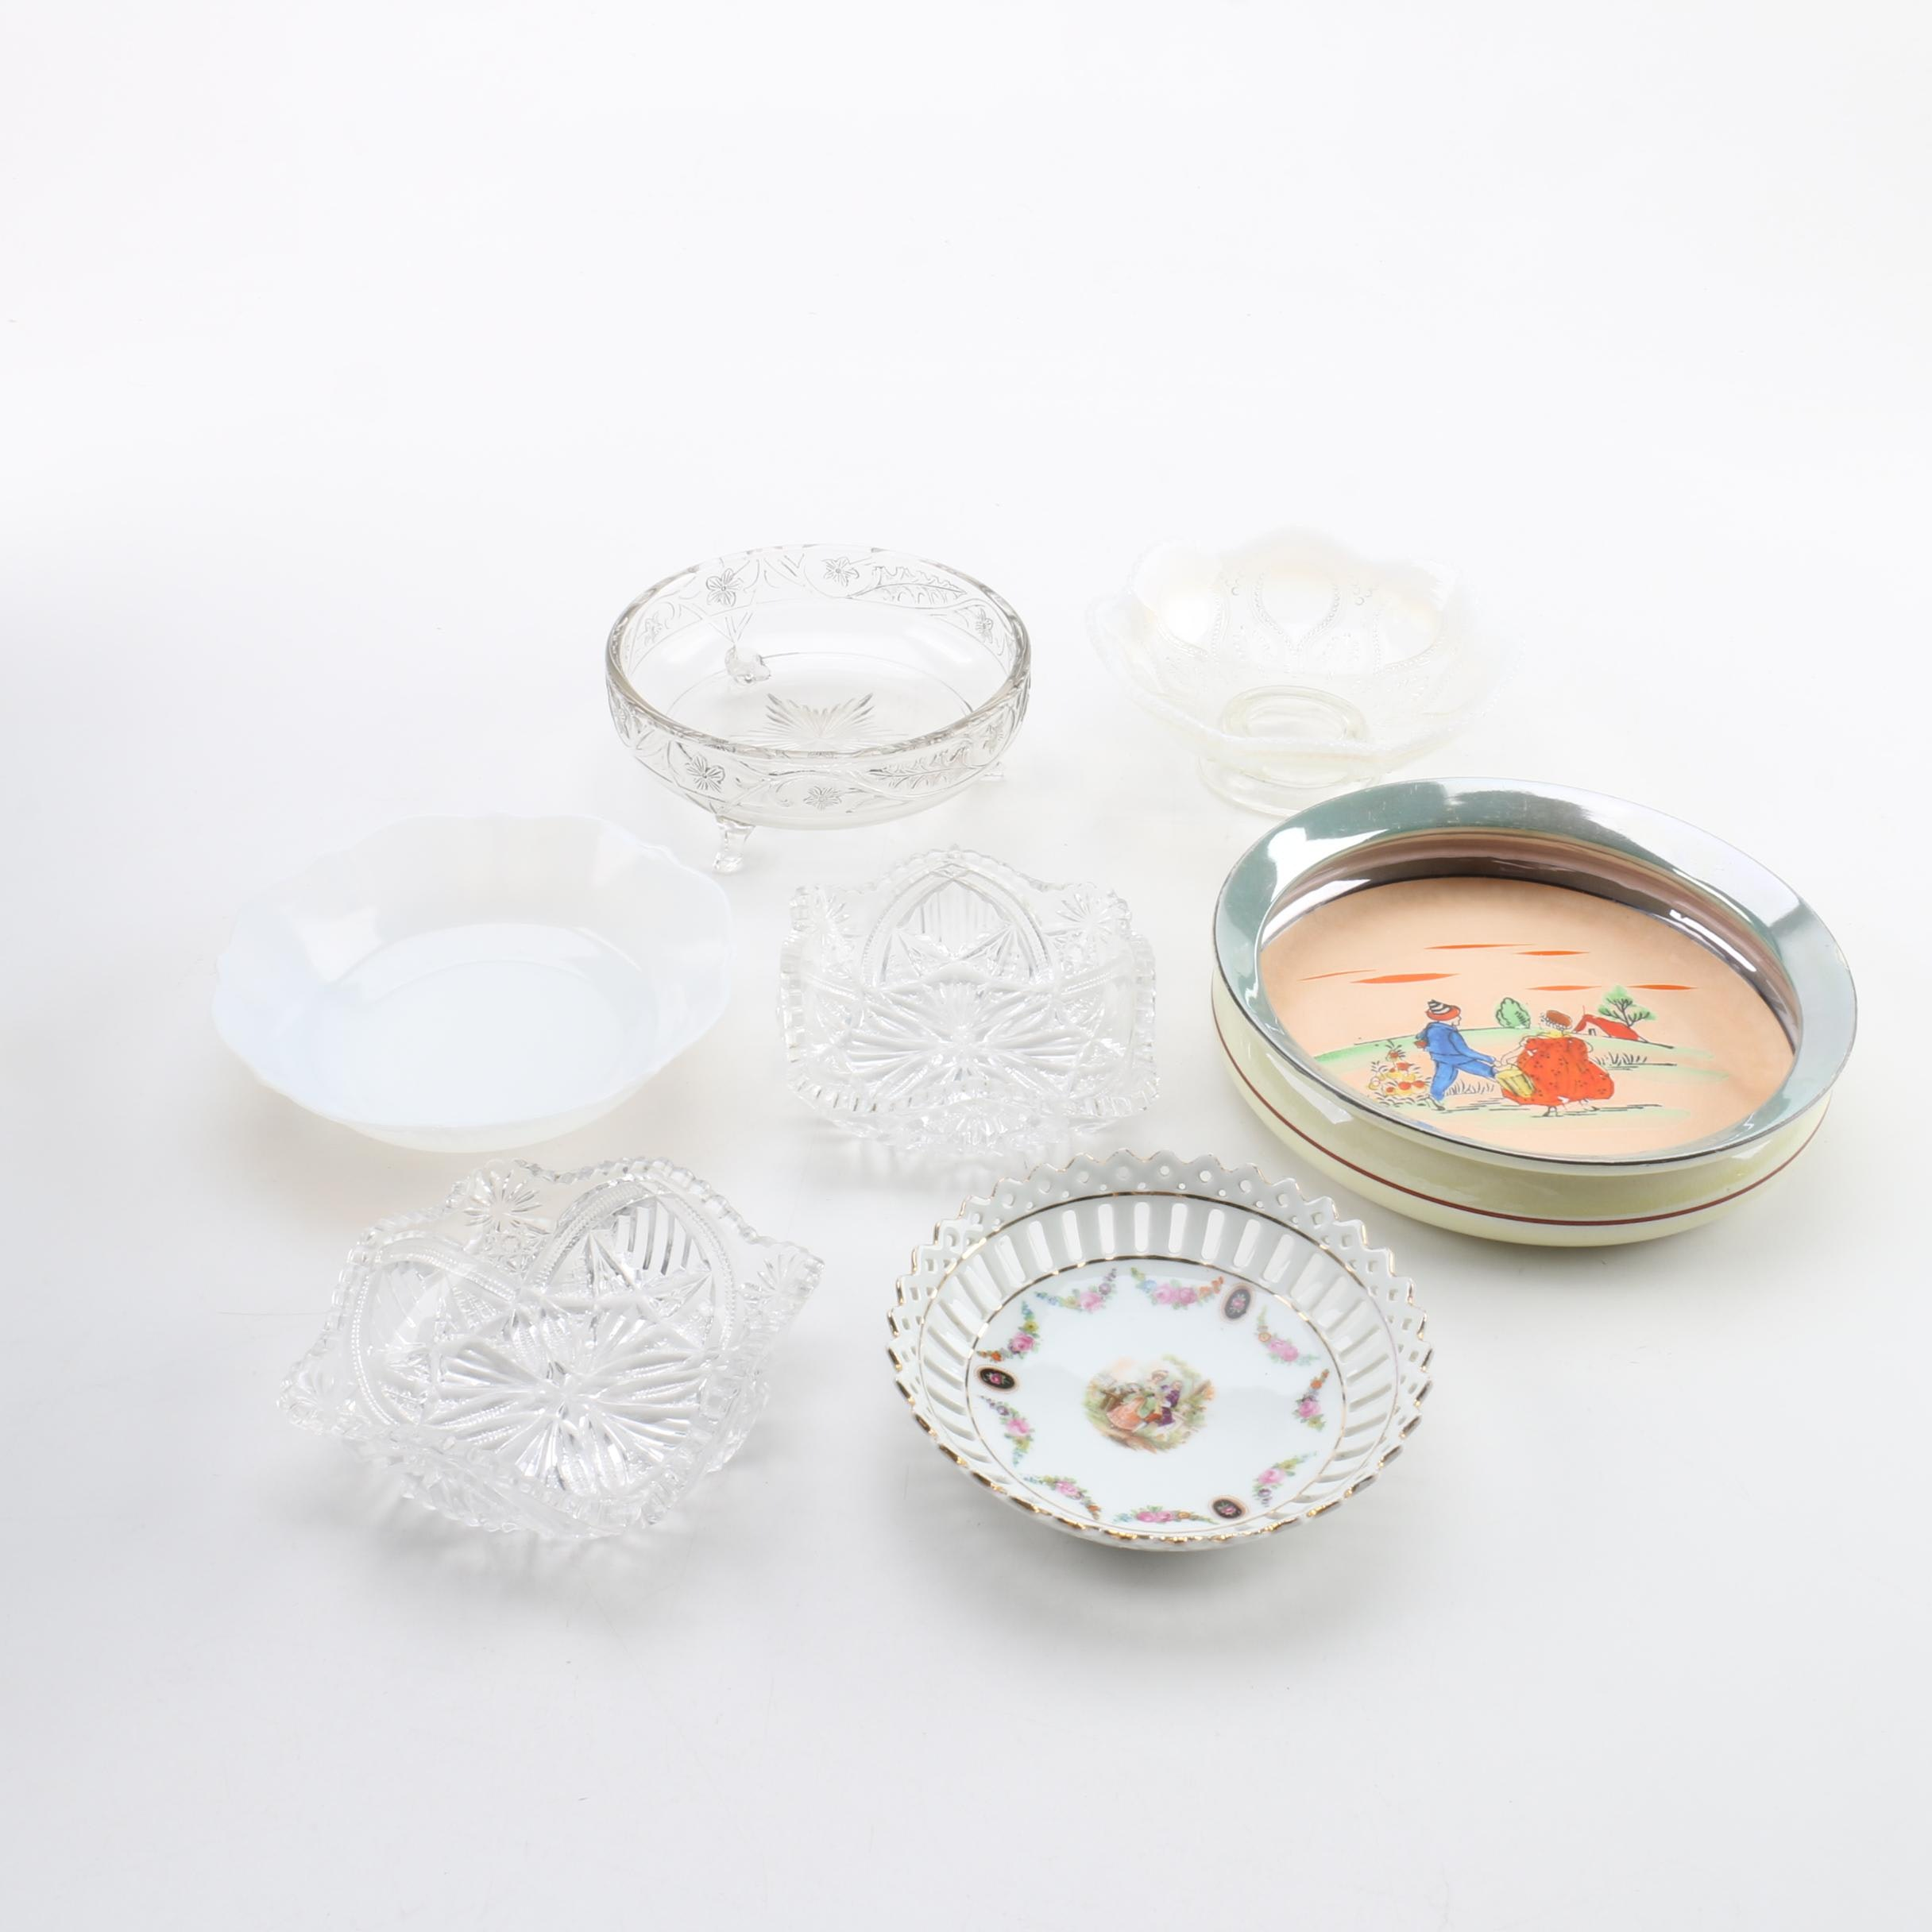 Assortment of Decorative Porcelain and Glass Bowls